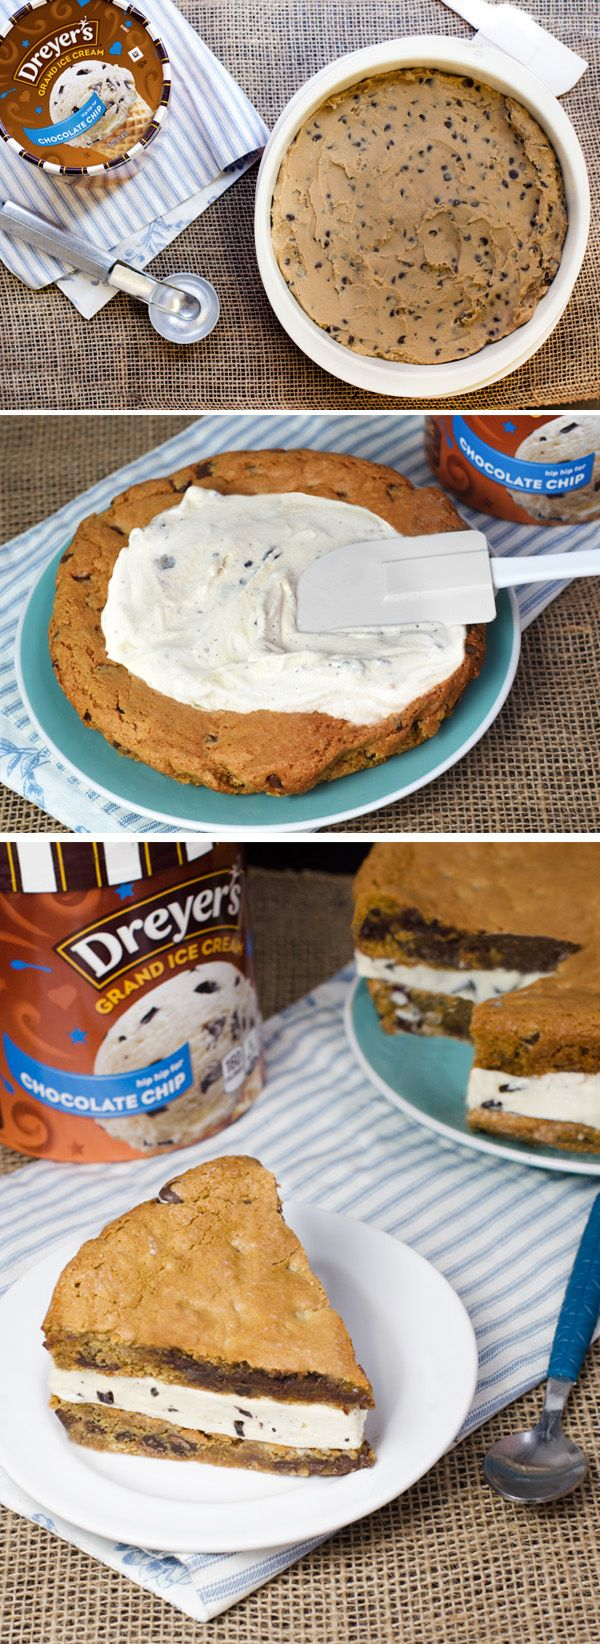 Dreyer's Giant Cookie Ice Cream Cake